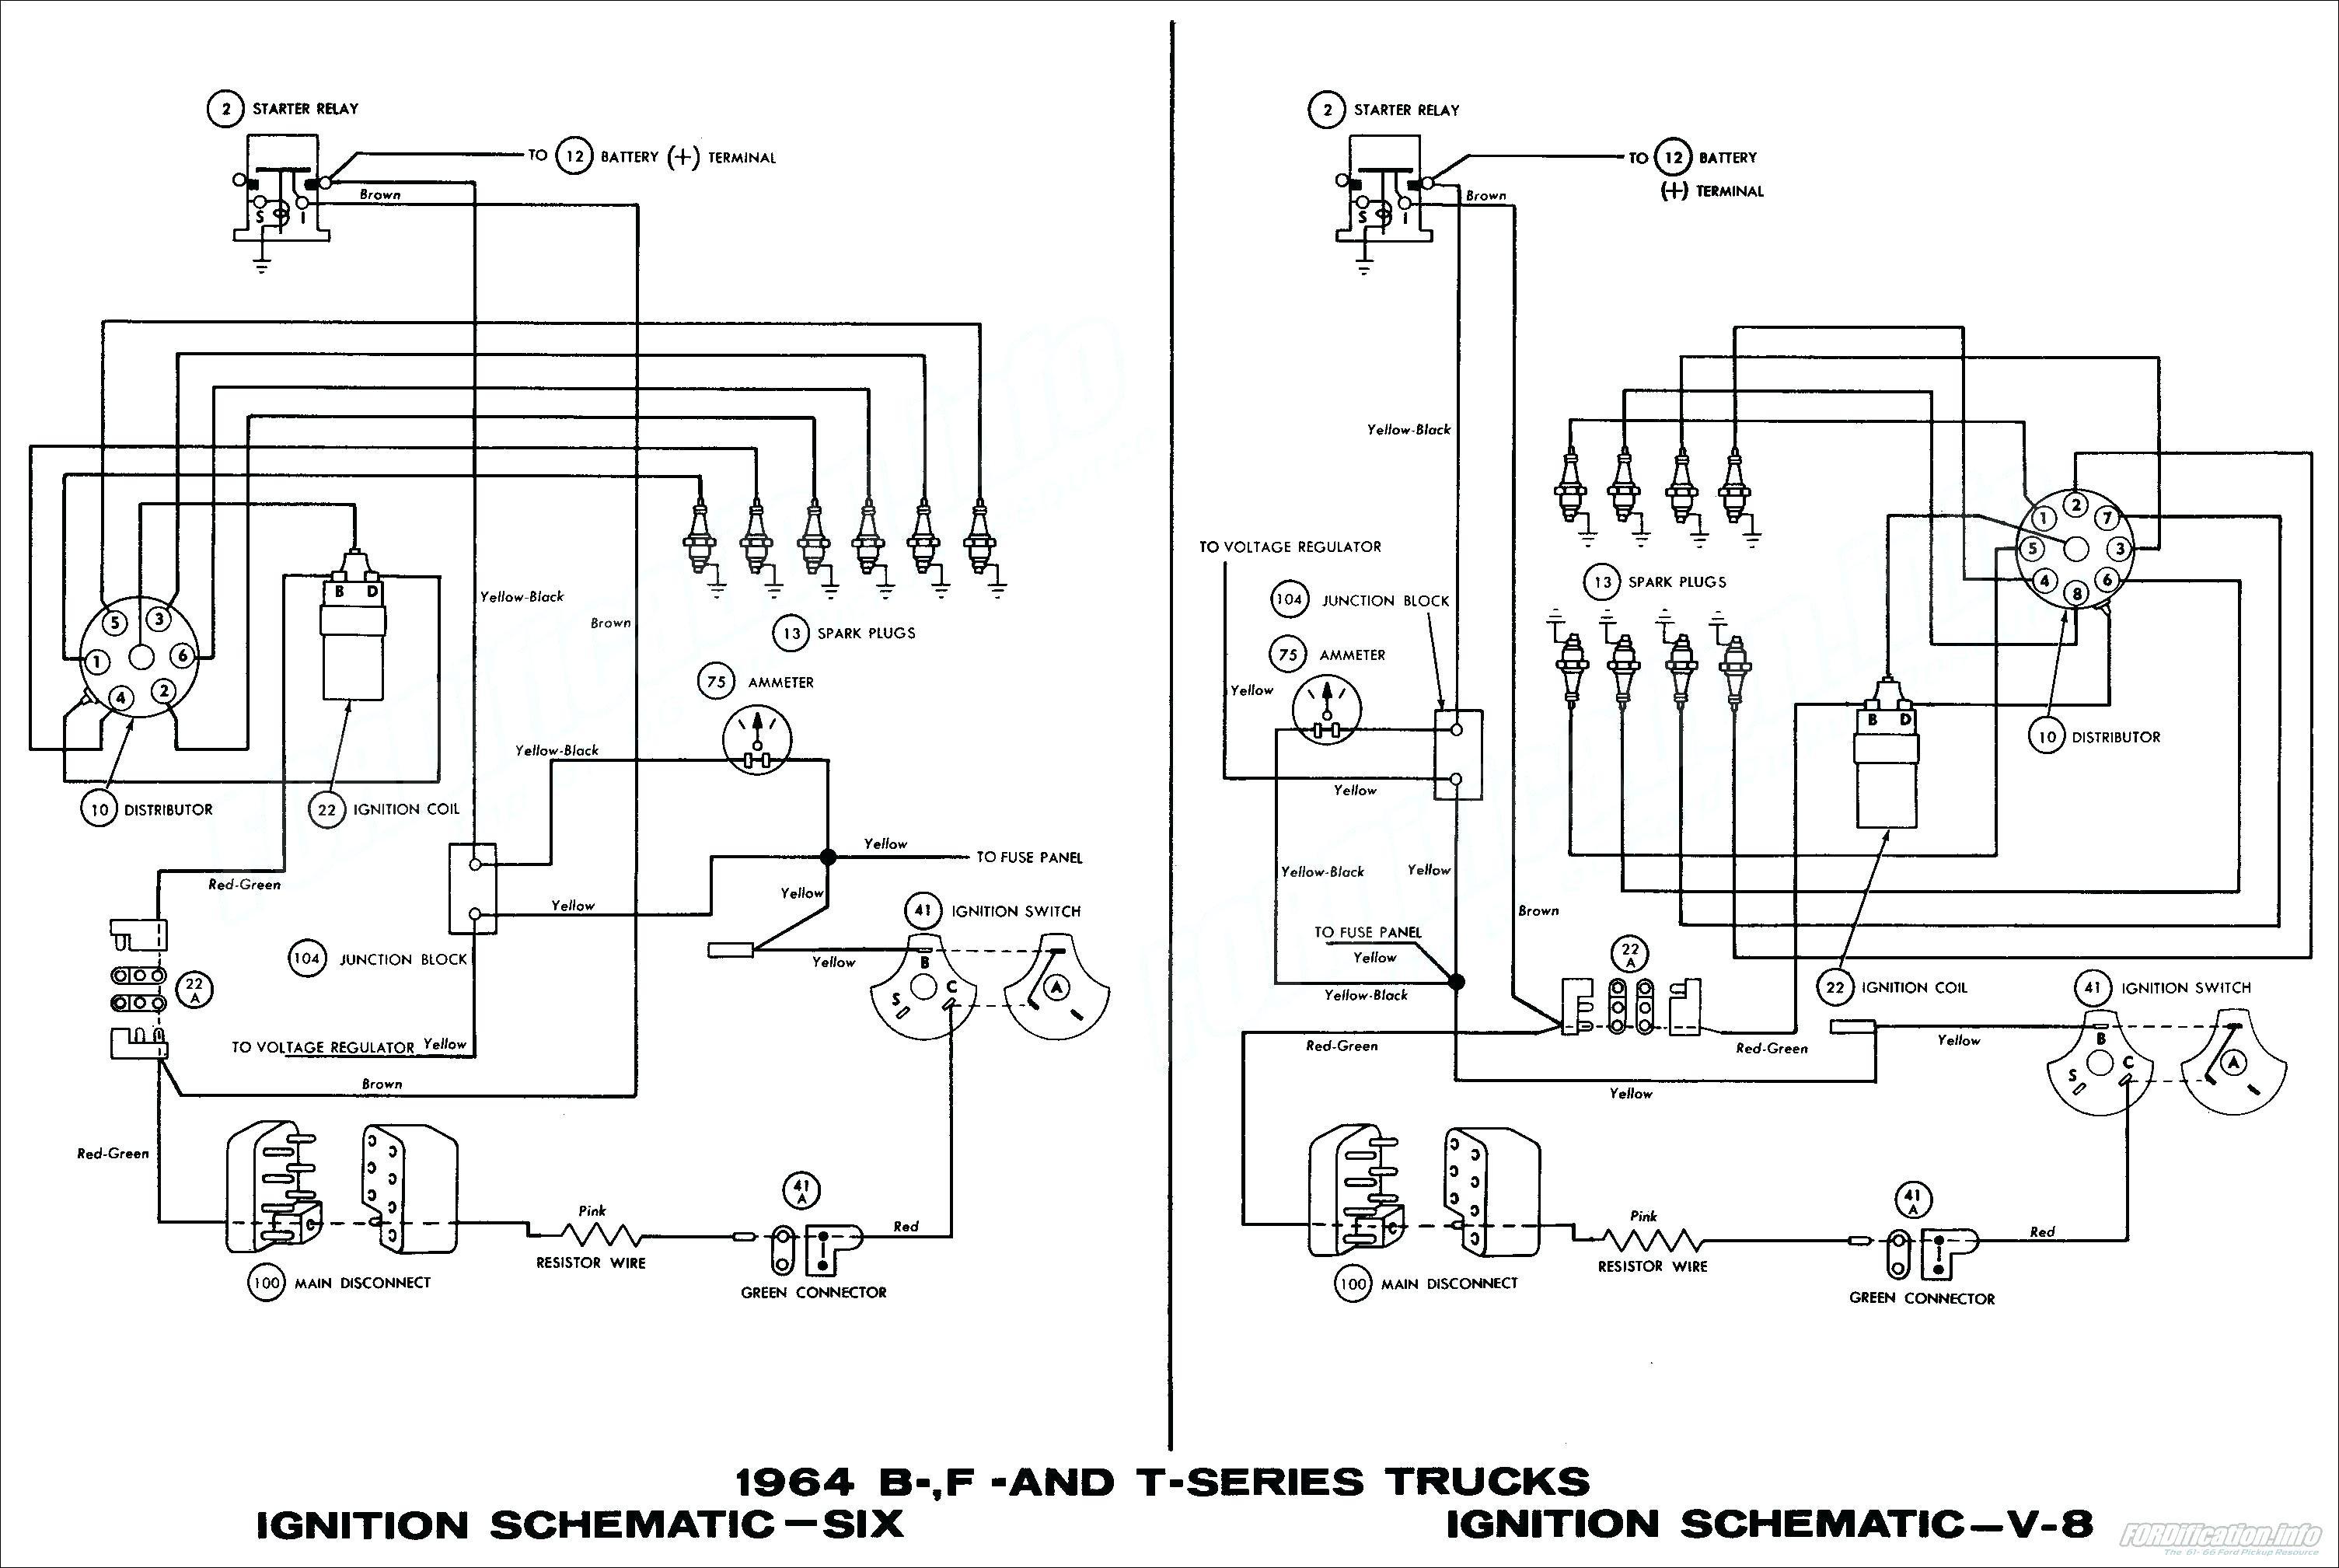 Chrysler 3 8 Engine Diagram My Wiring Dodge Liter Serpentine Belt 300 7 Pin Plug Of